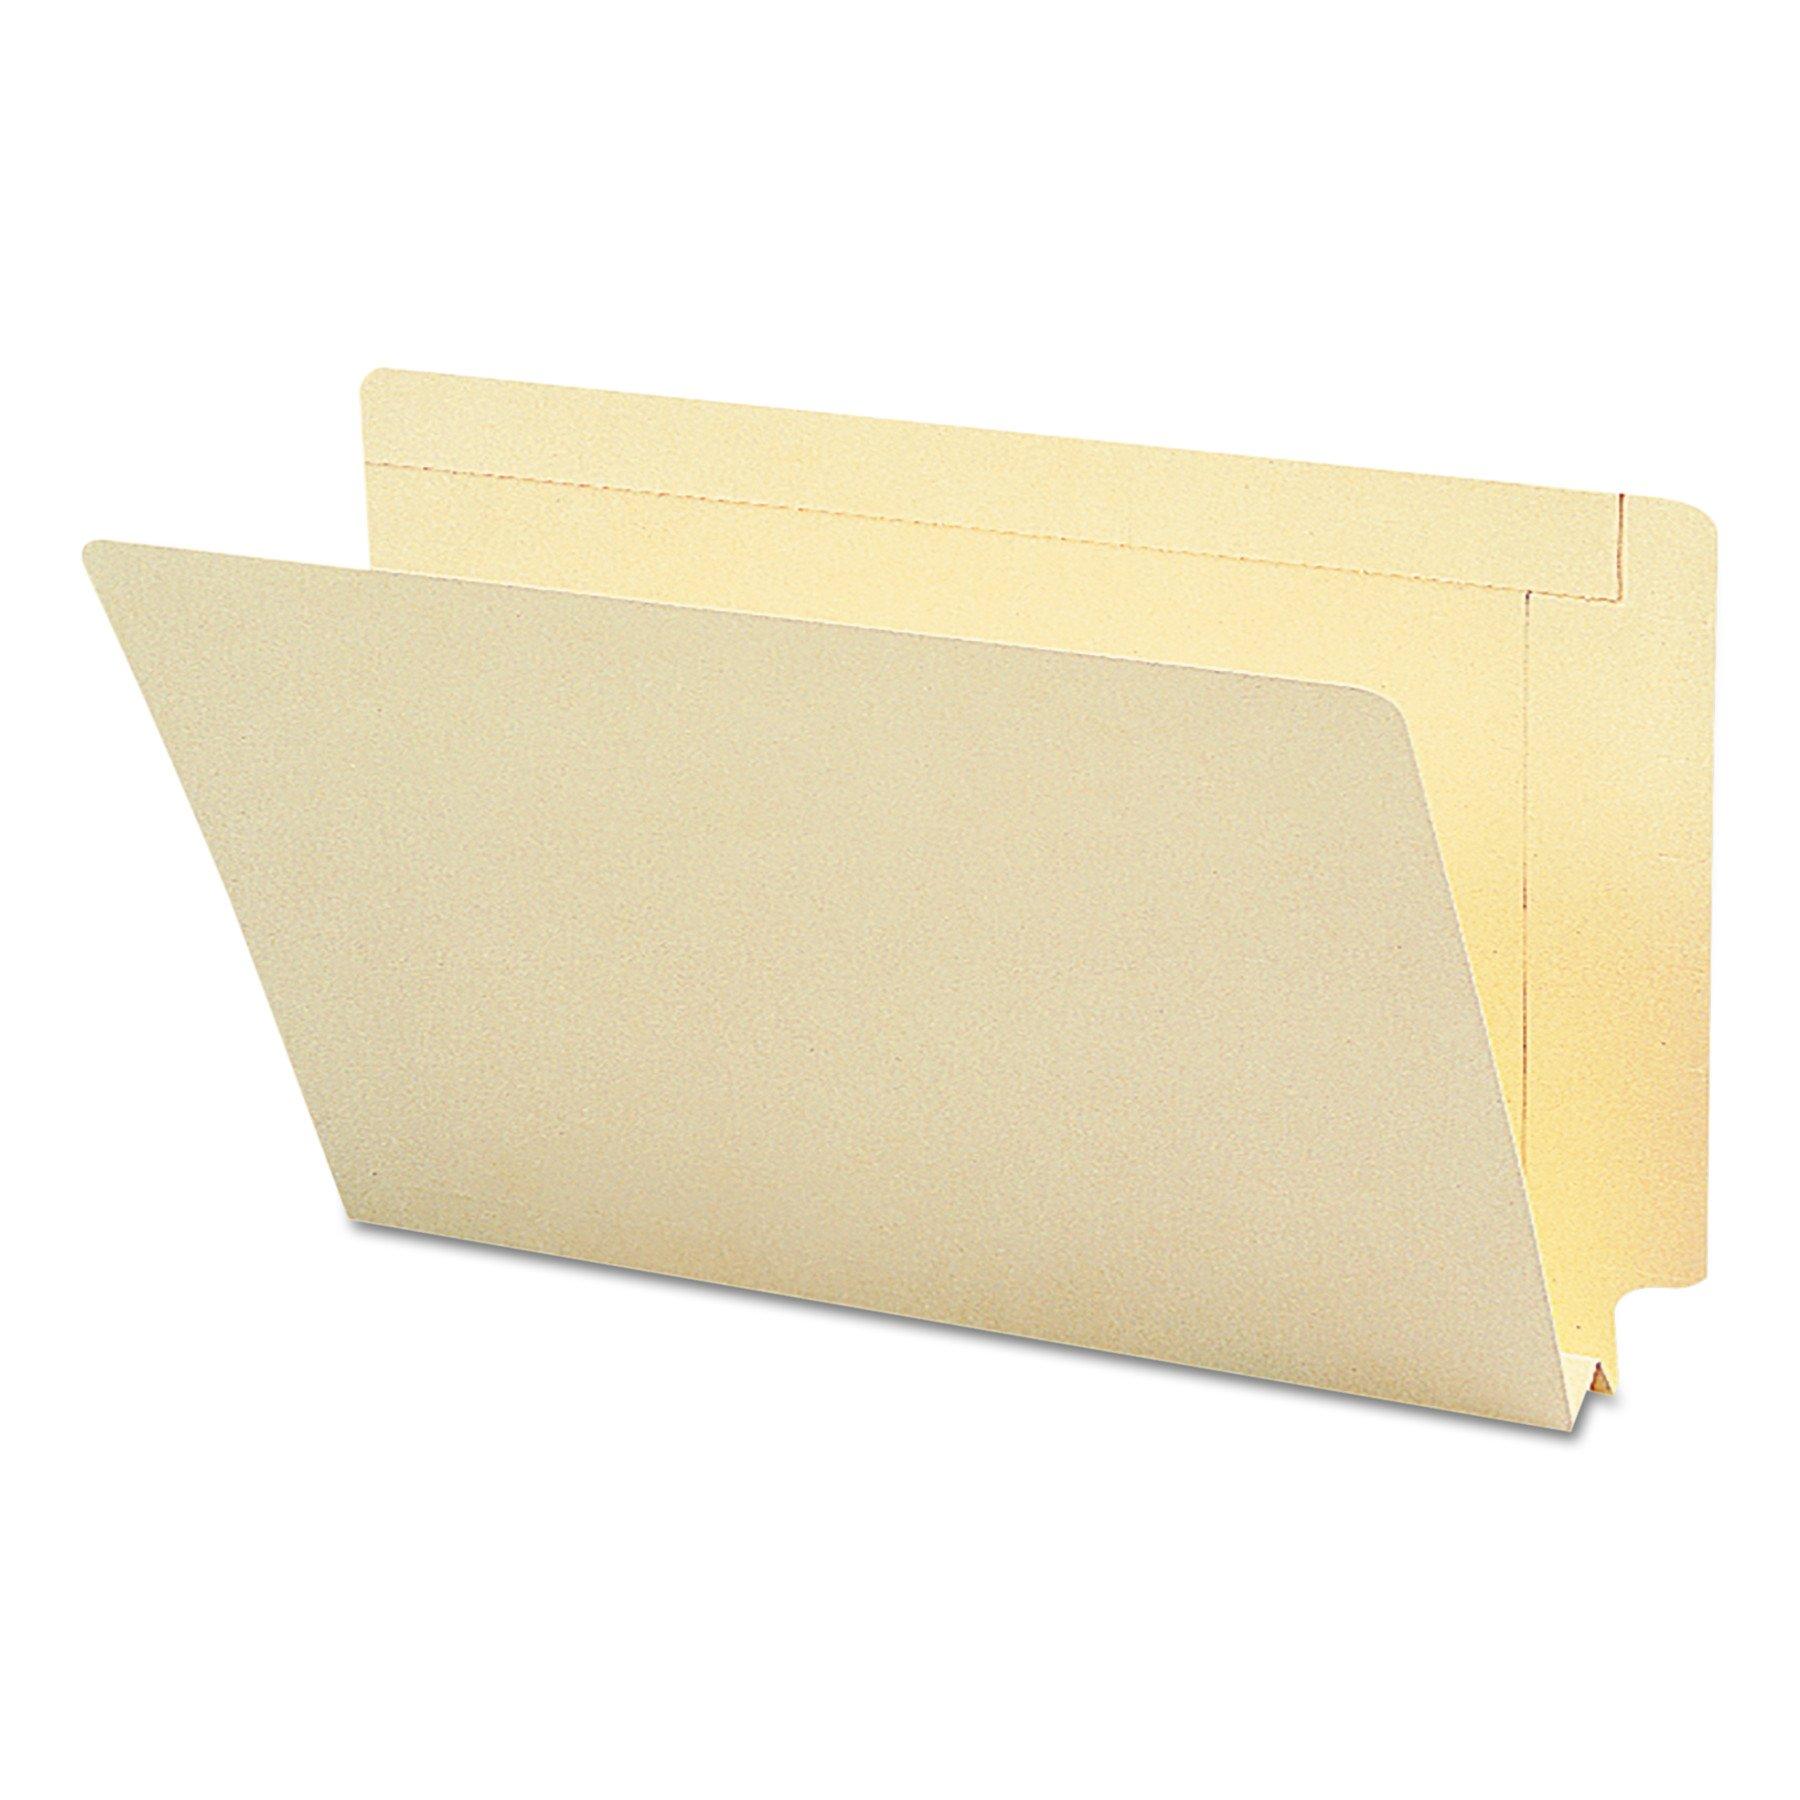 Smead End Tab Heavyweight File Folder, Reinforced Straight-Cut Tab, 1-1/2'' Expansion, Legal Size, Manila, 50 per Box (27275) by Smead